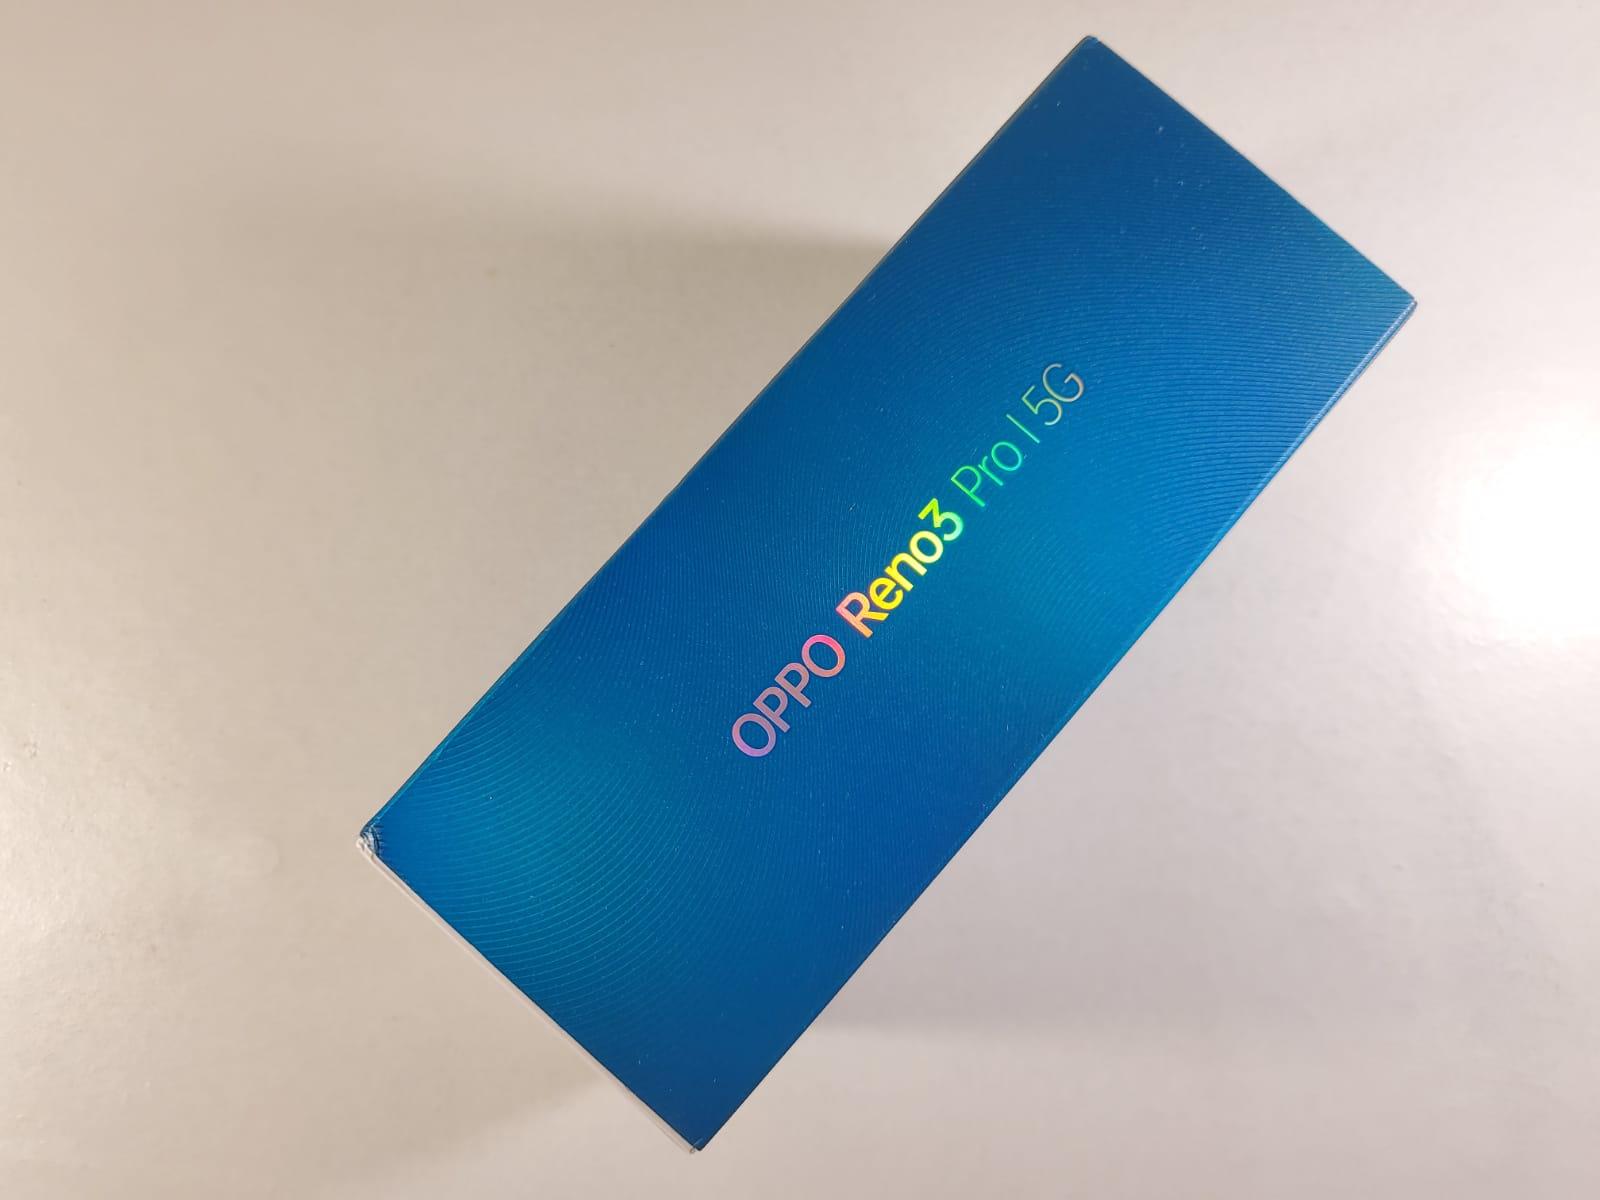 Unboxing și primele impresii Oppo Reno 3 Pro 5G